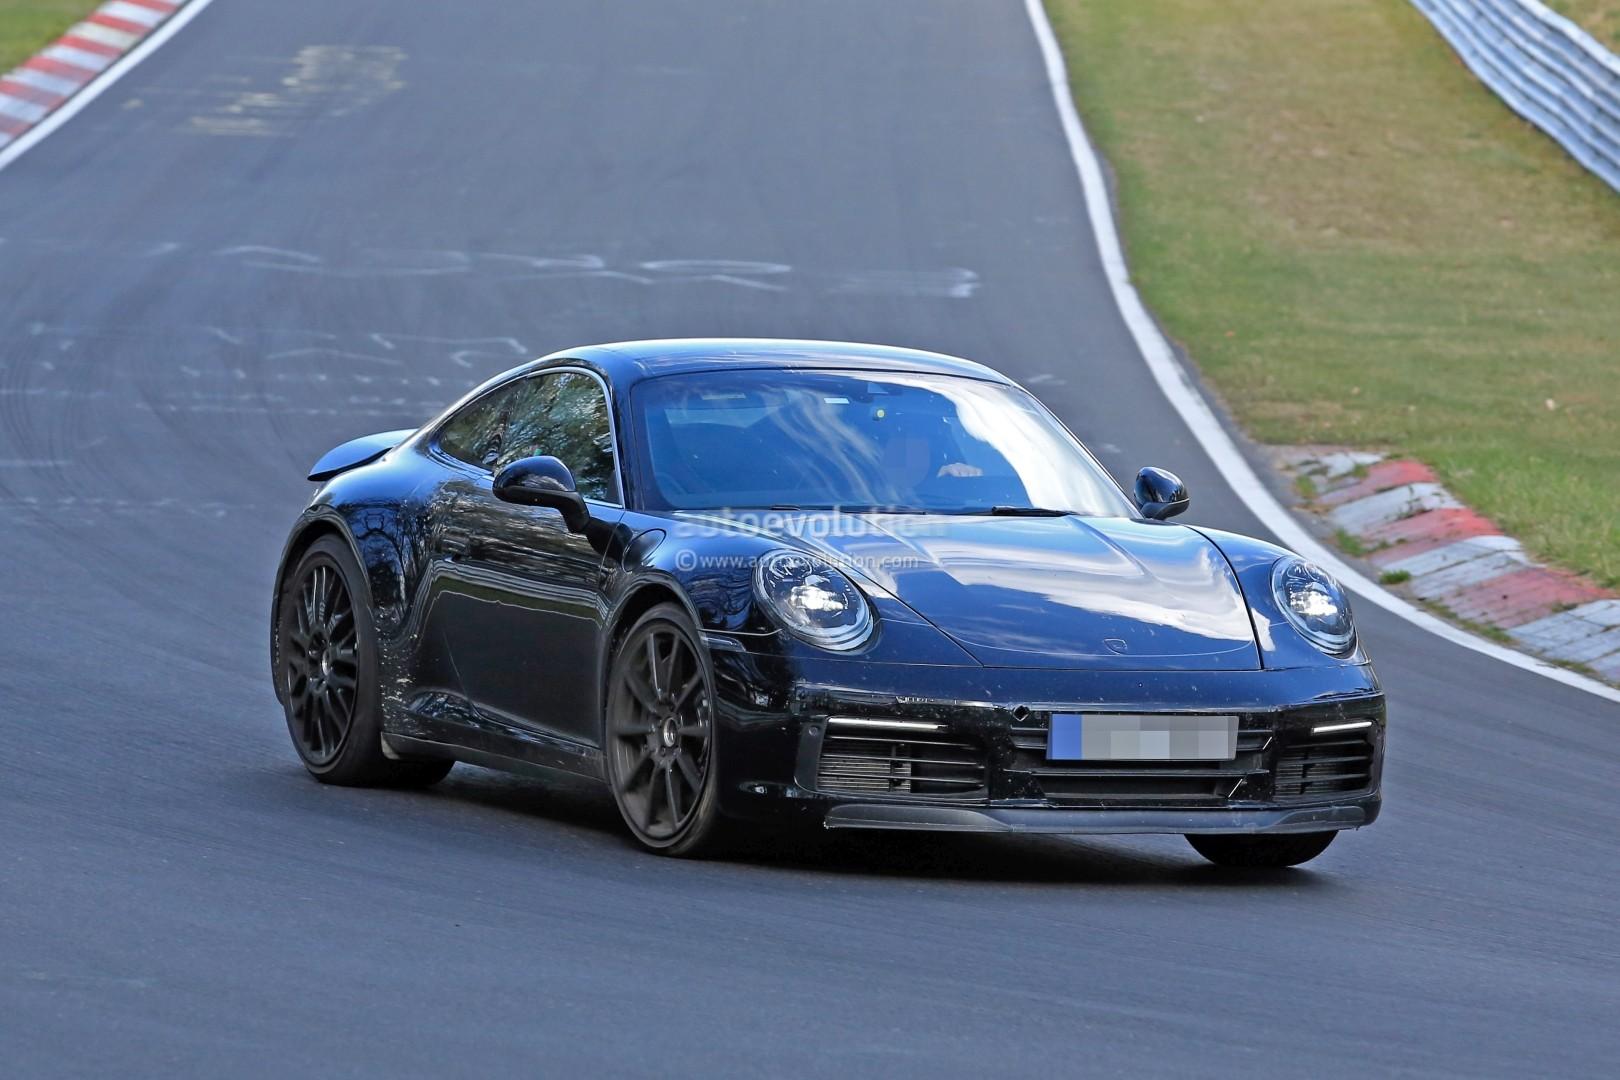 2018 - [Porsche] 911 - Page 3 New-2019-porsche-911-makes-nurburgring-debut-prototype-has-mysterios-fuel-door_3